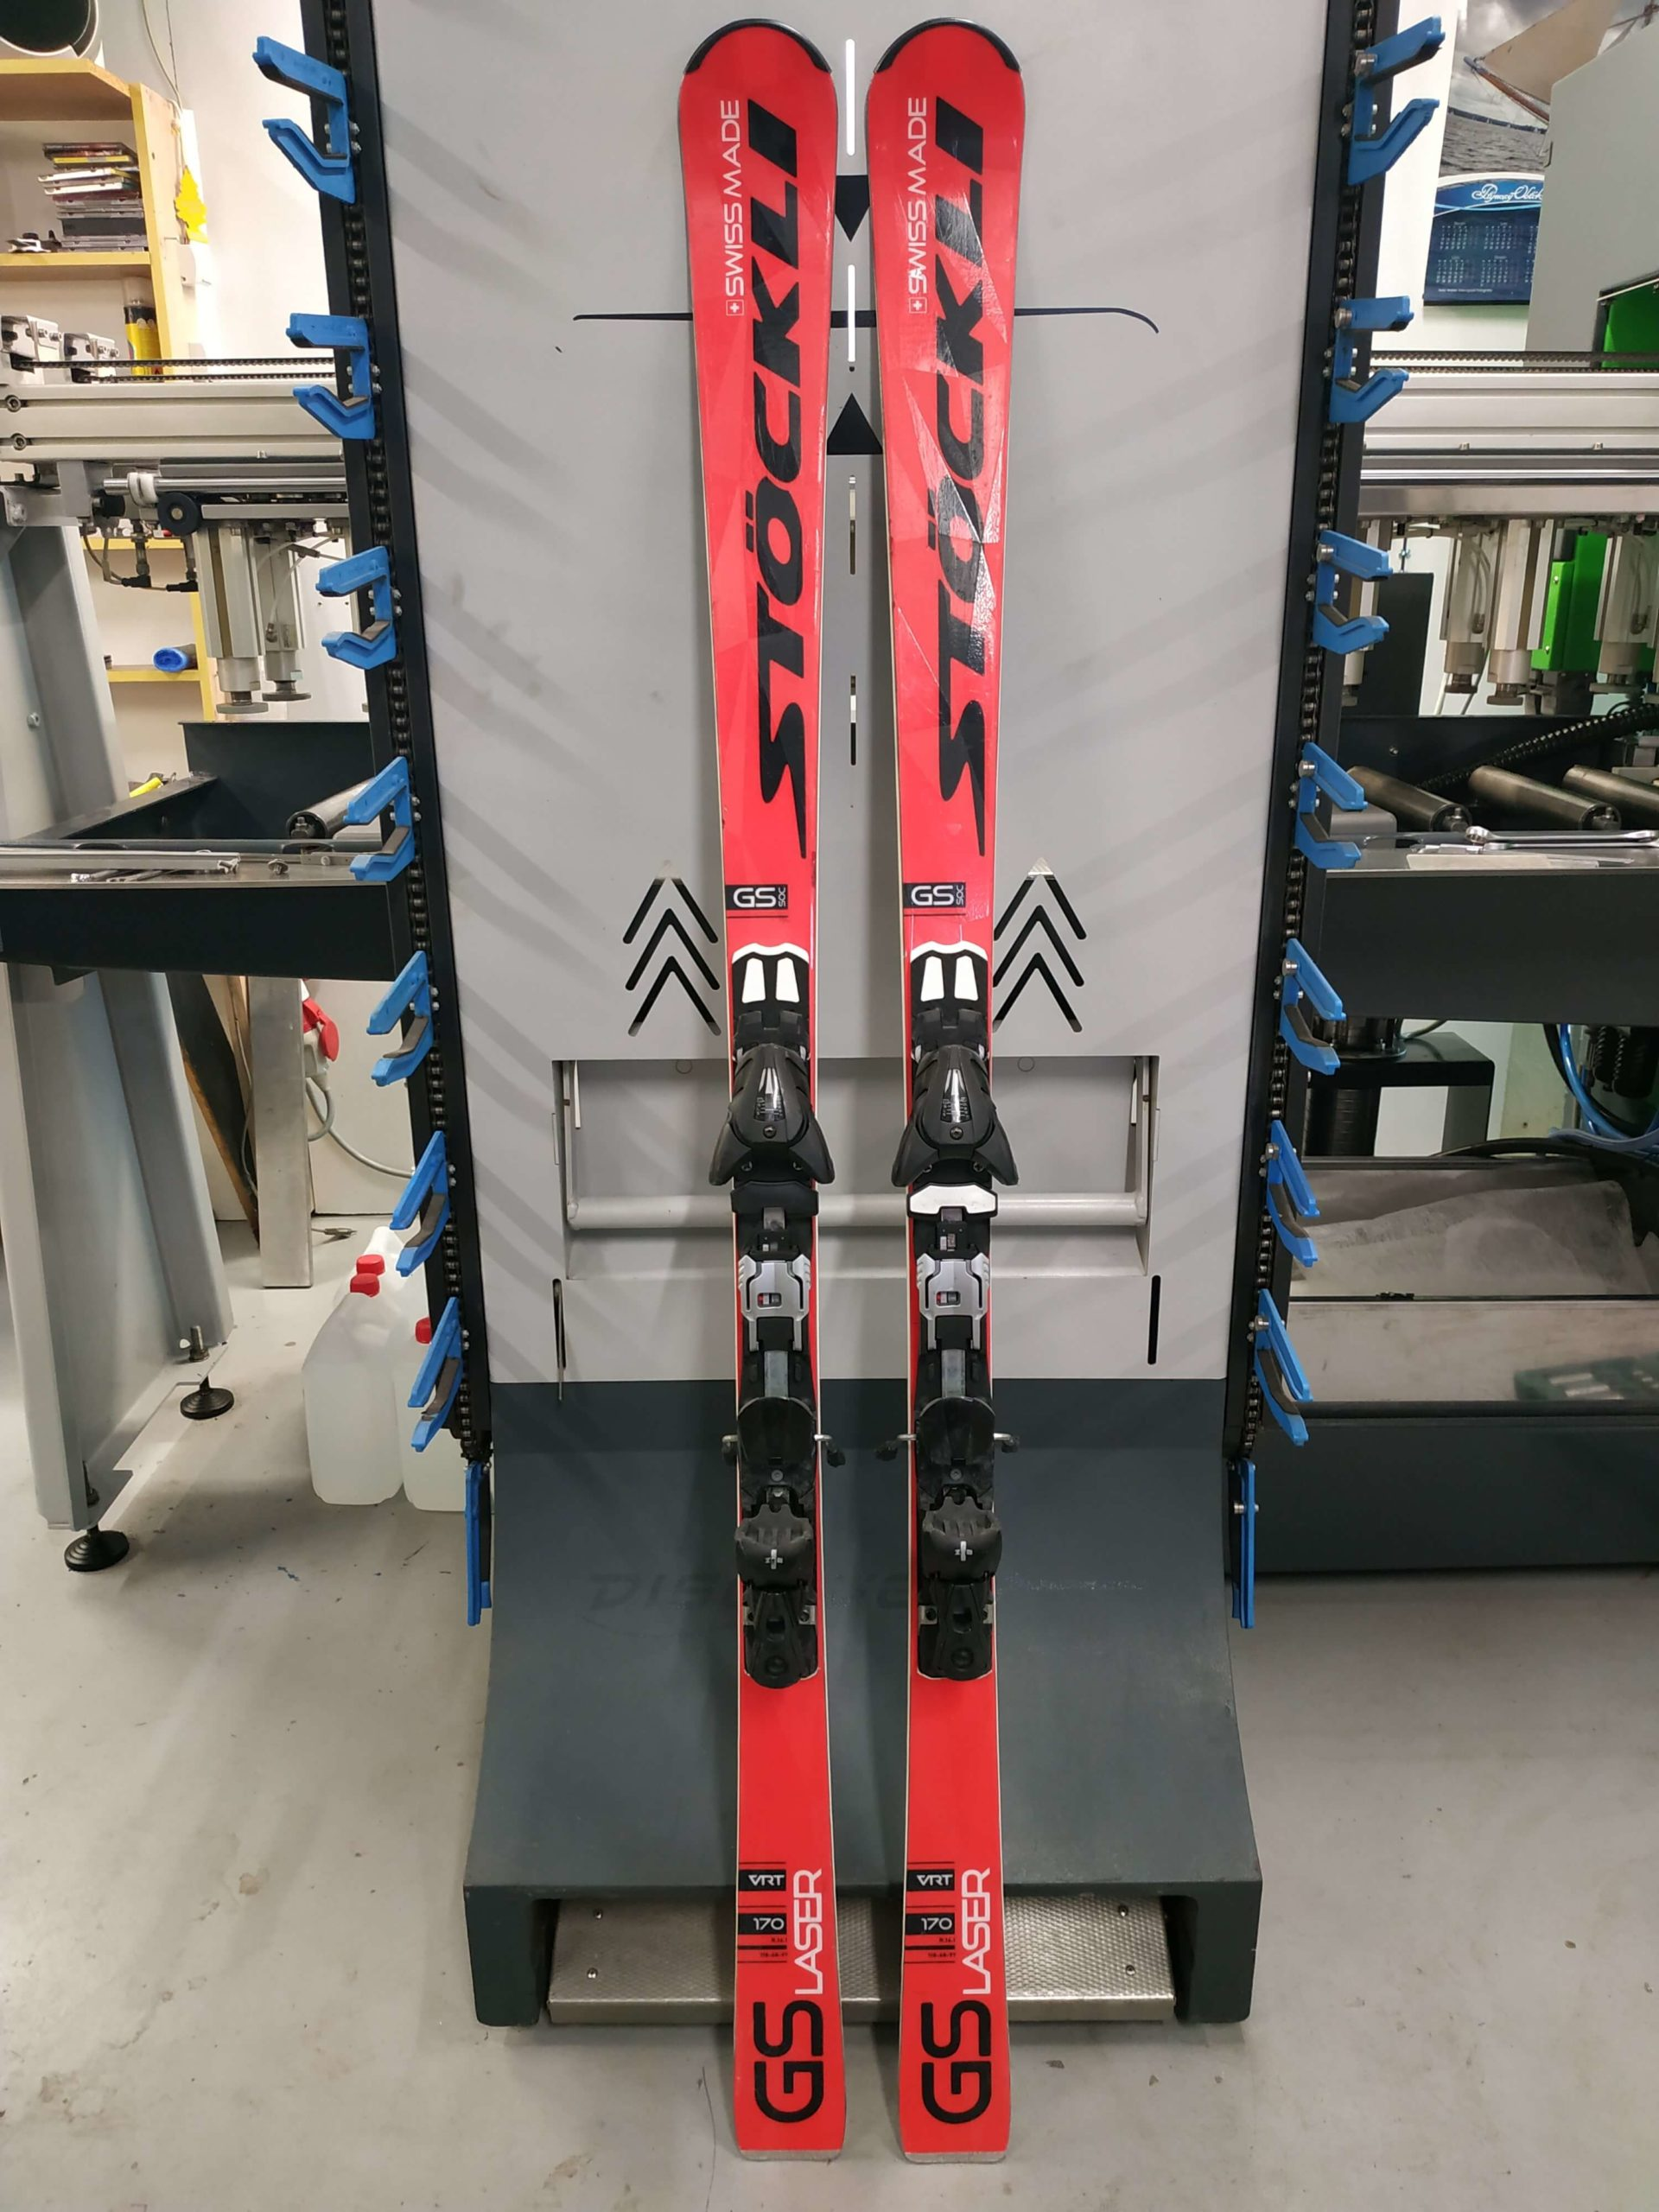 3. Stockli GS Laser VRT 170 R16.1 (1)